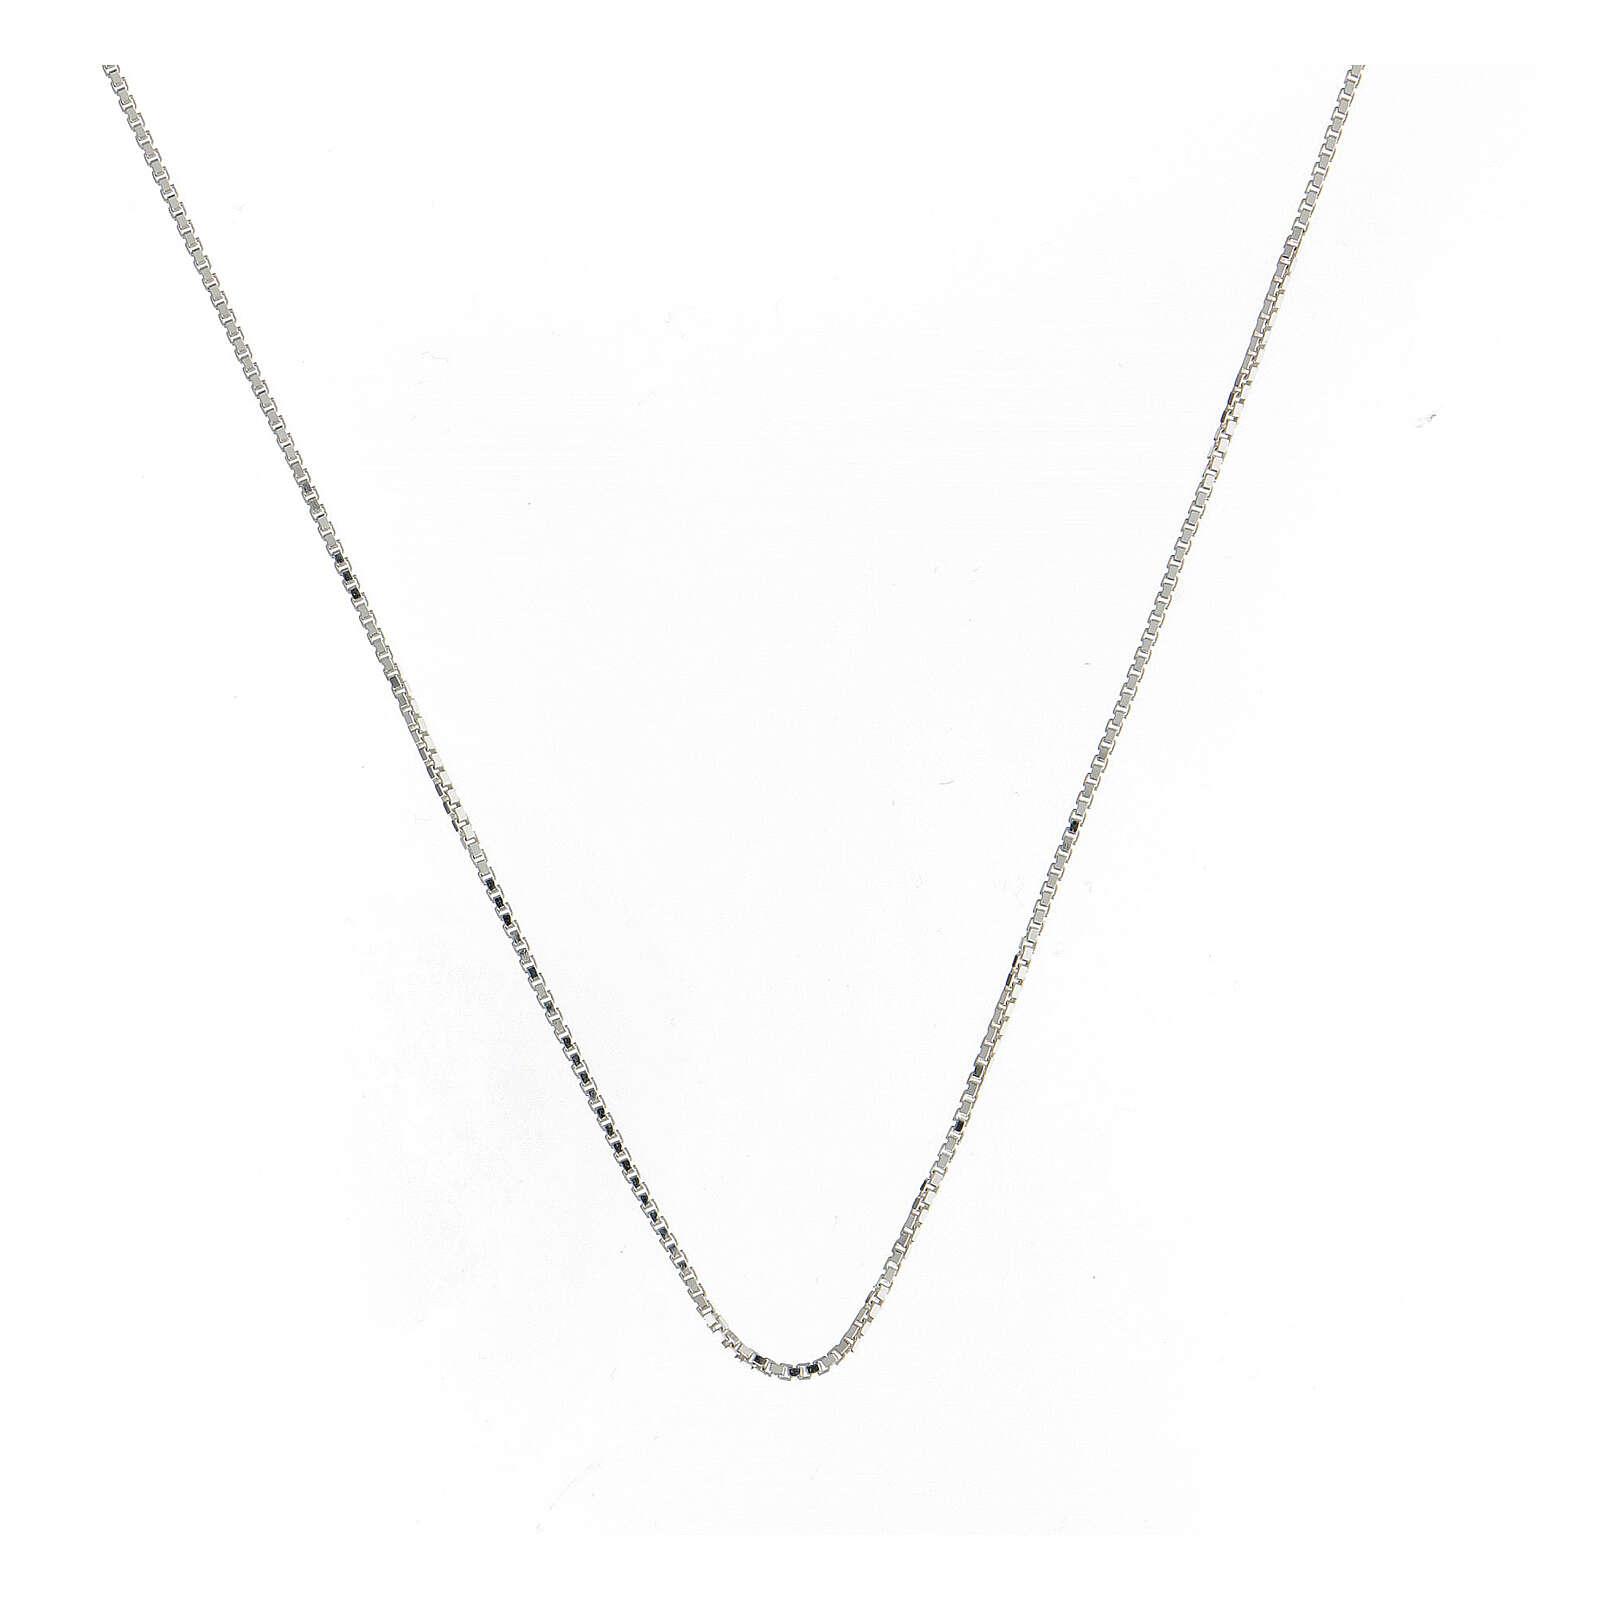 Catena veneta argento 925 lung. 50 cm 4